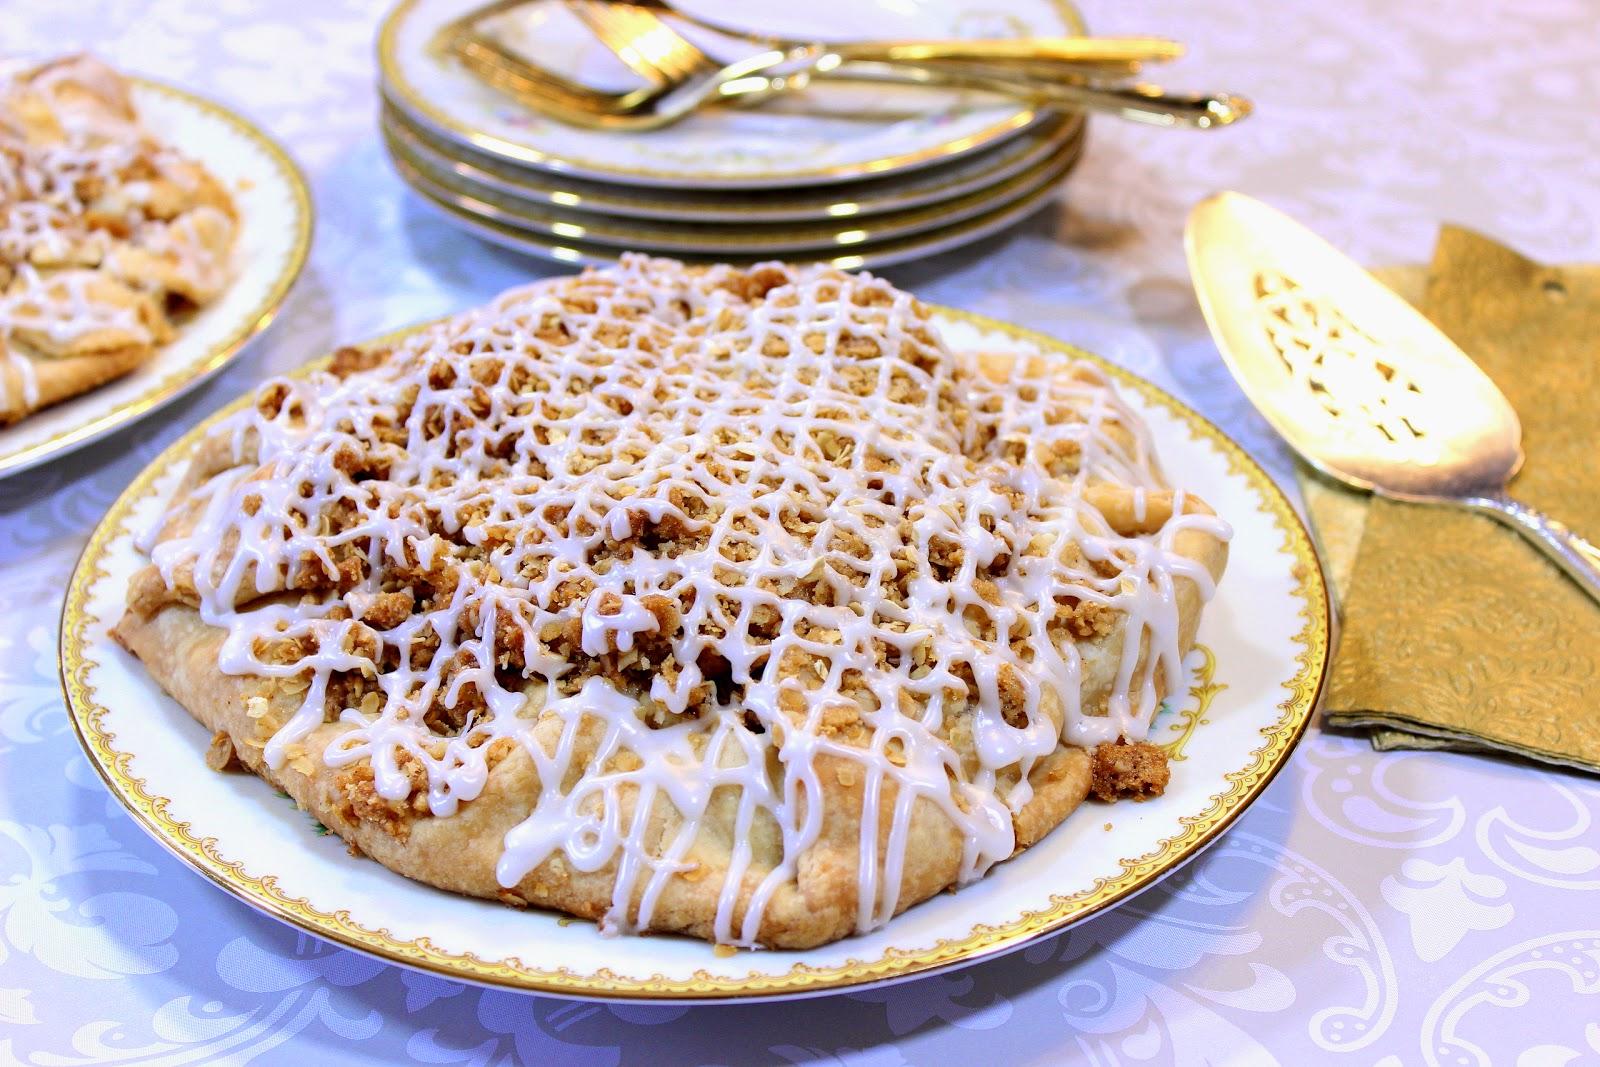 http://www.kudoskitchenbyrenee.com/2015/04/apple-crumble-crostata.html